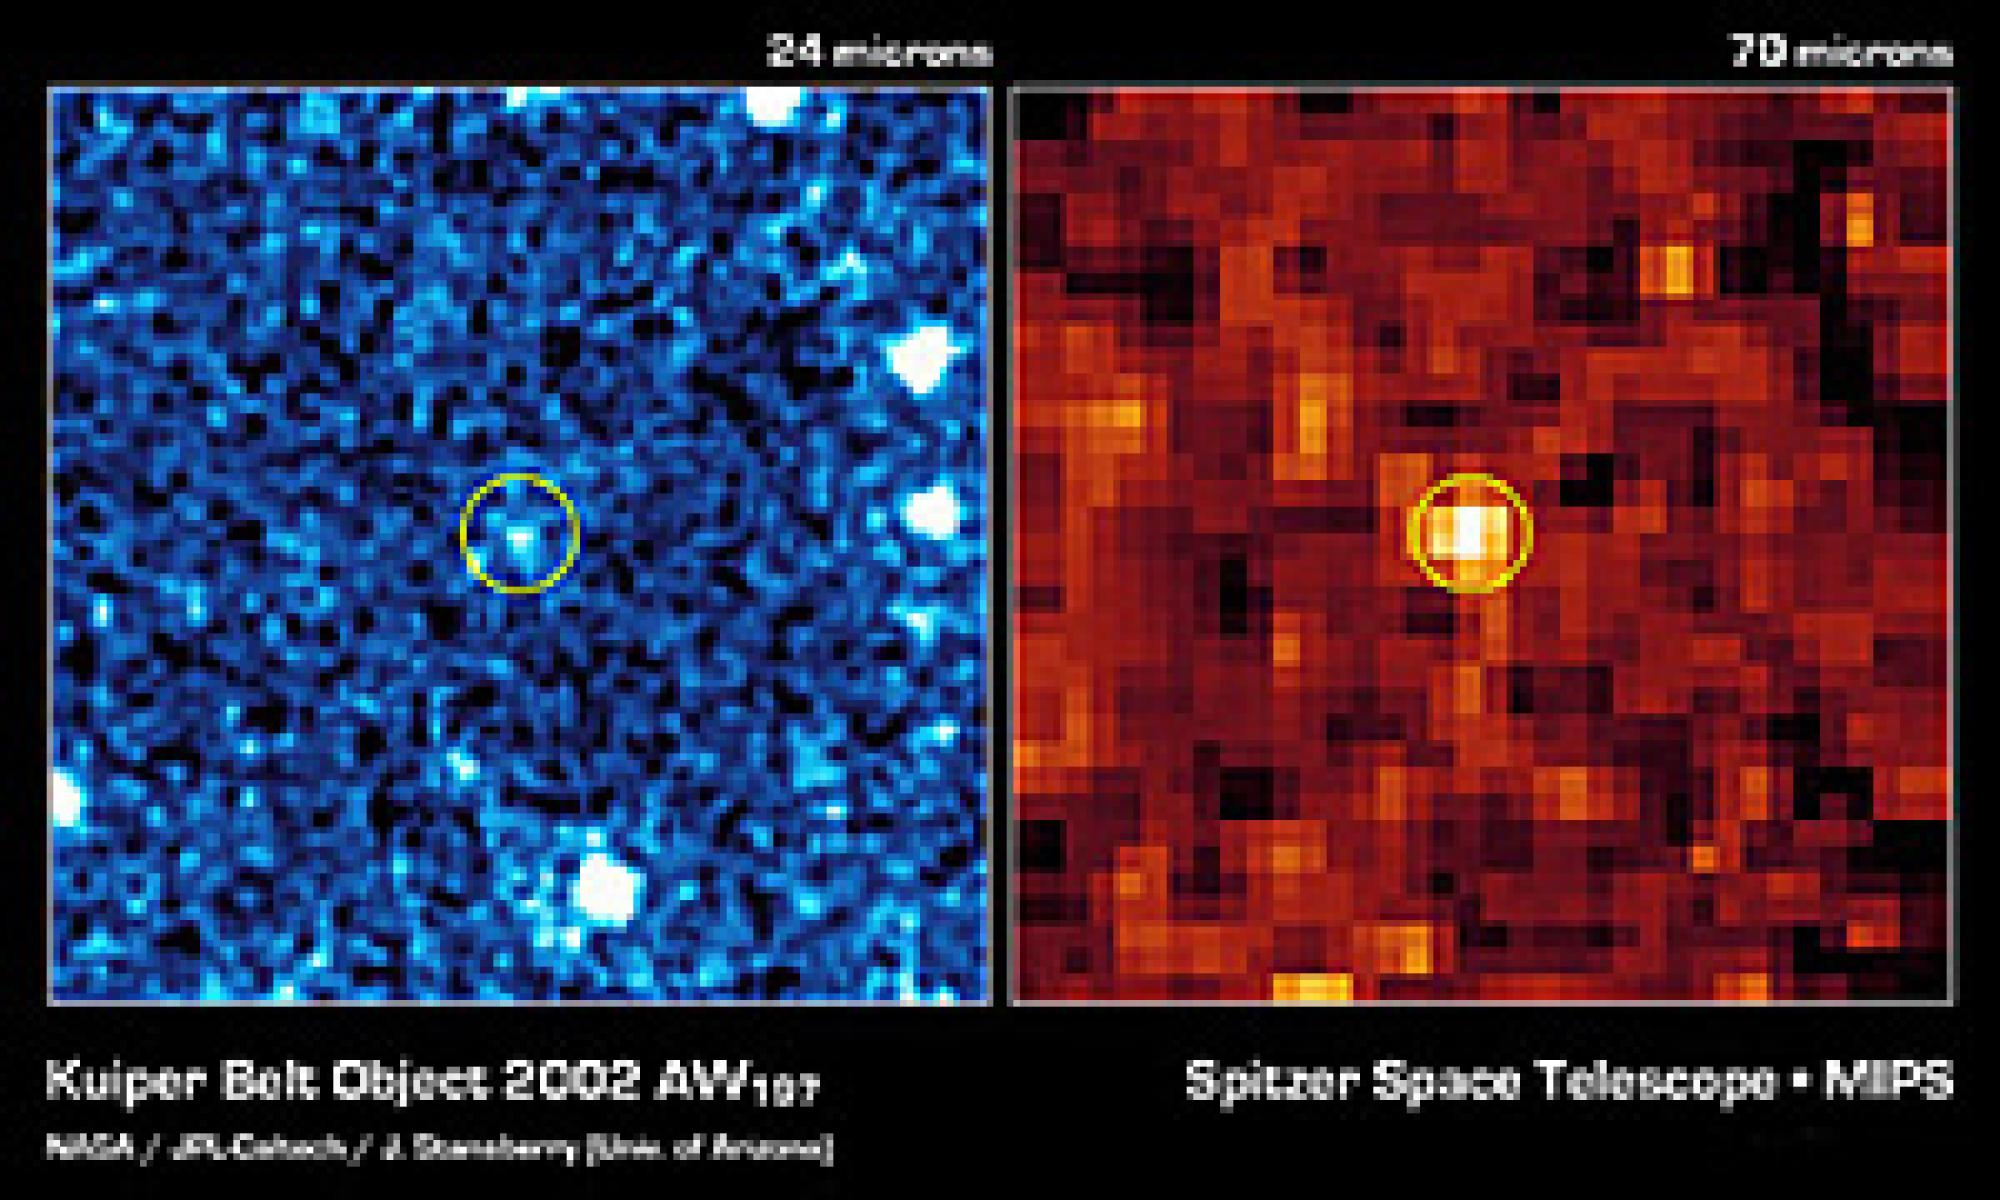 Kuiper Belt Object 2002 AW197